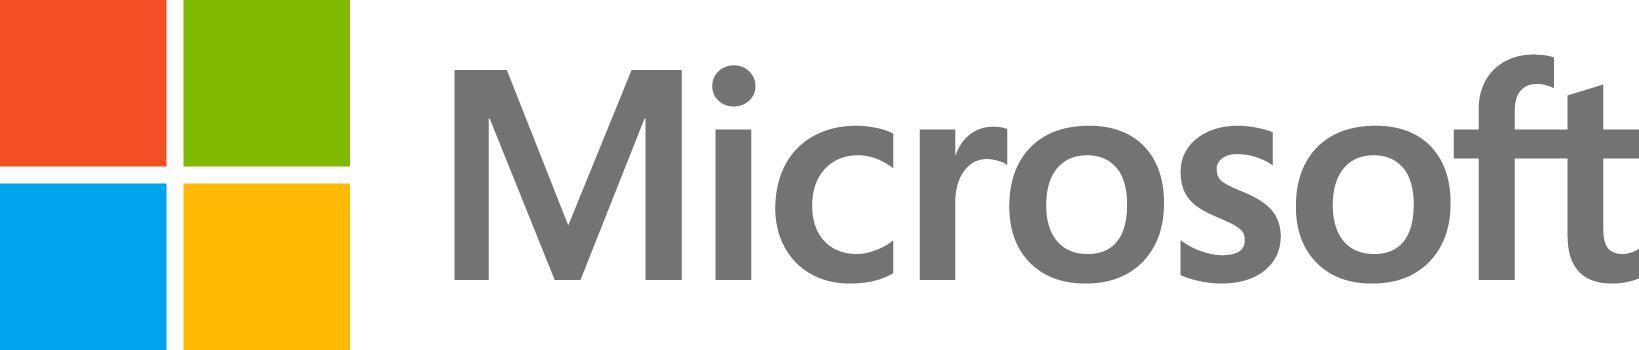 Microsoft_logo_Print